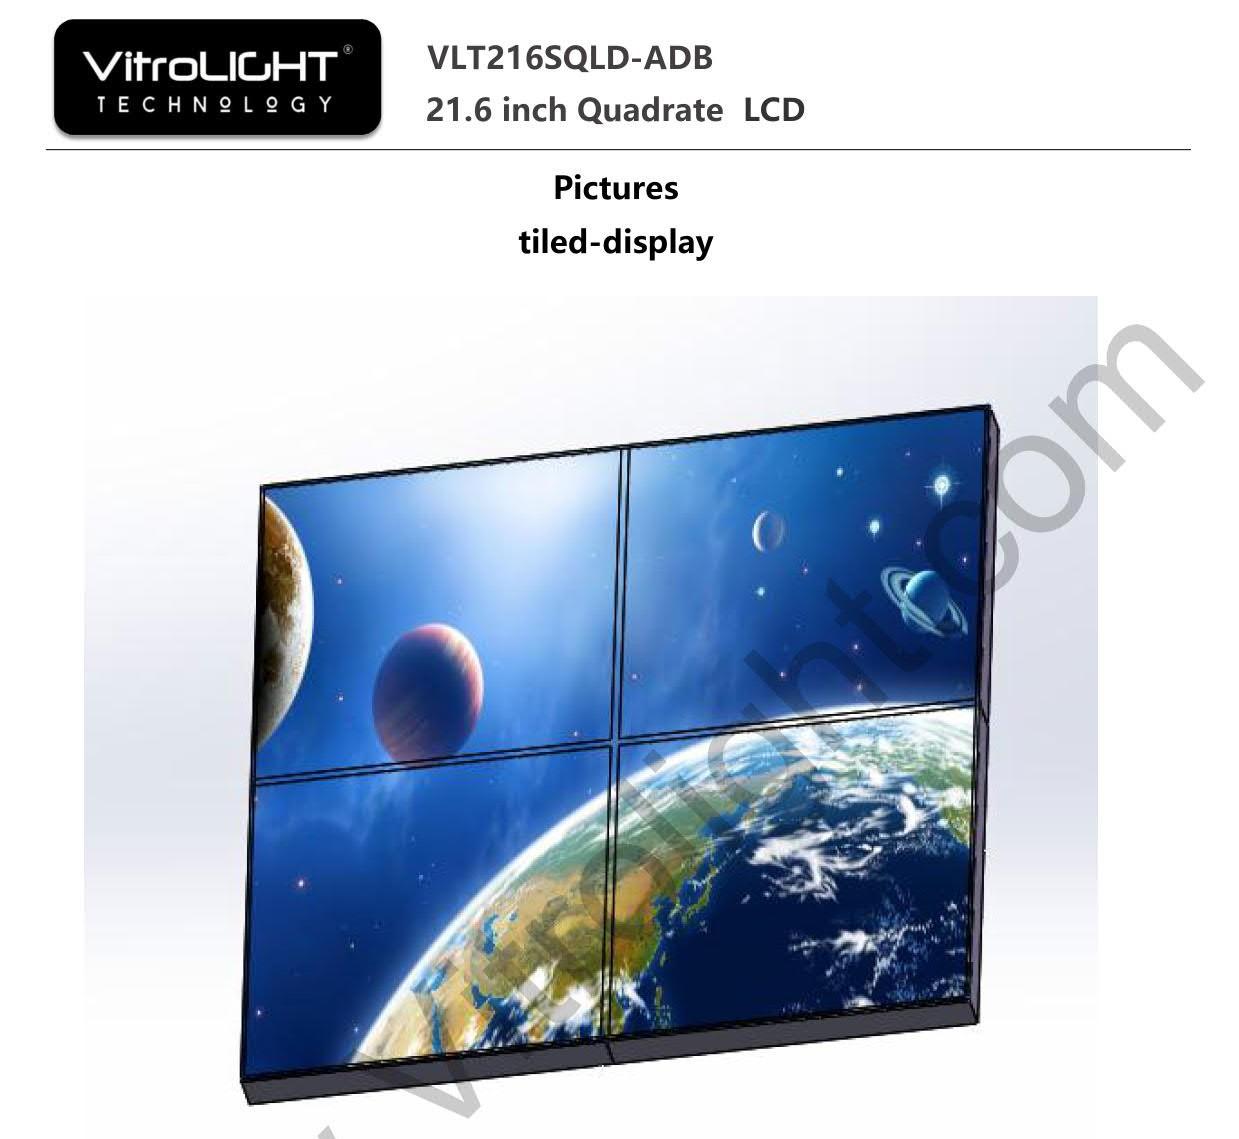 VLT216SQLD-ADB